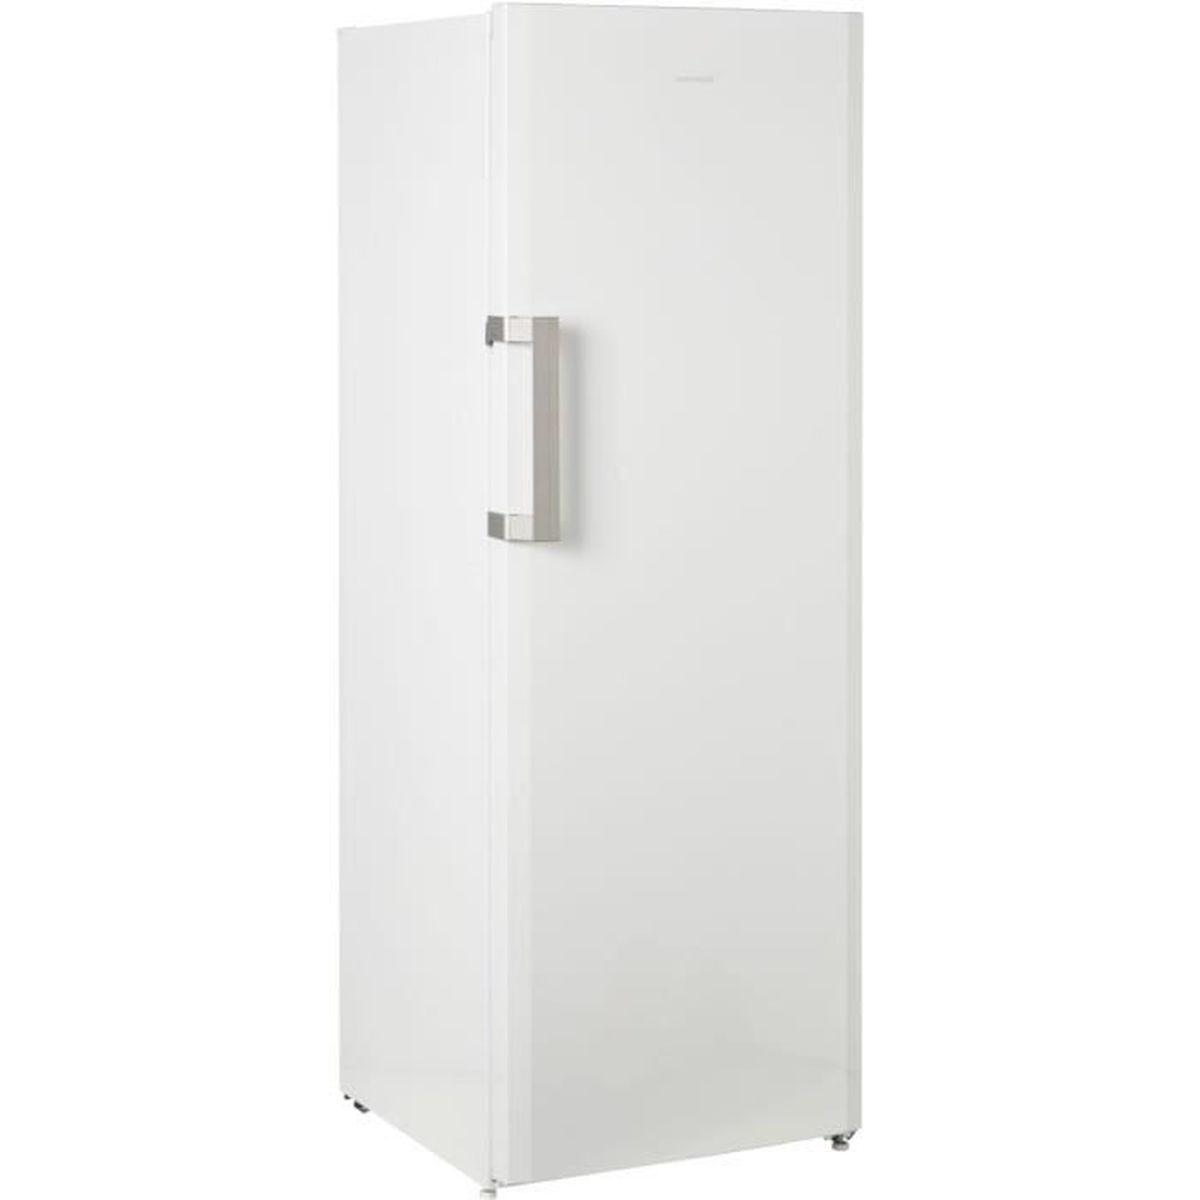 cong lateur armoire essentiel b ex ecav 170 60b2 achat. Black Bedroom Furniture Sets. Home Design Ideas